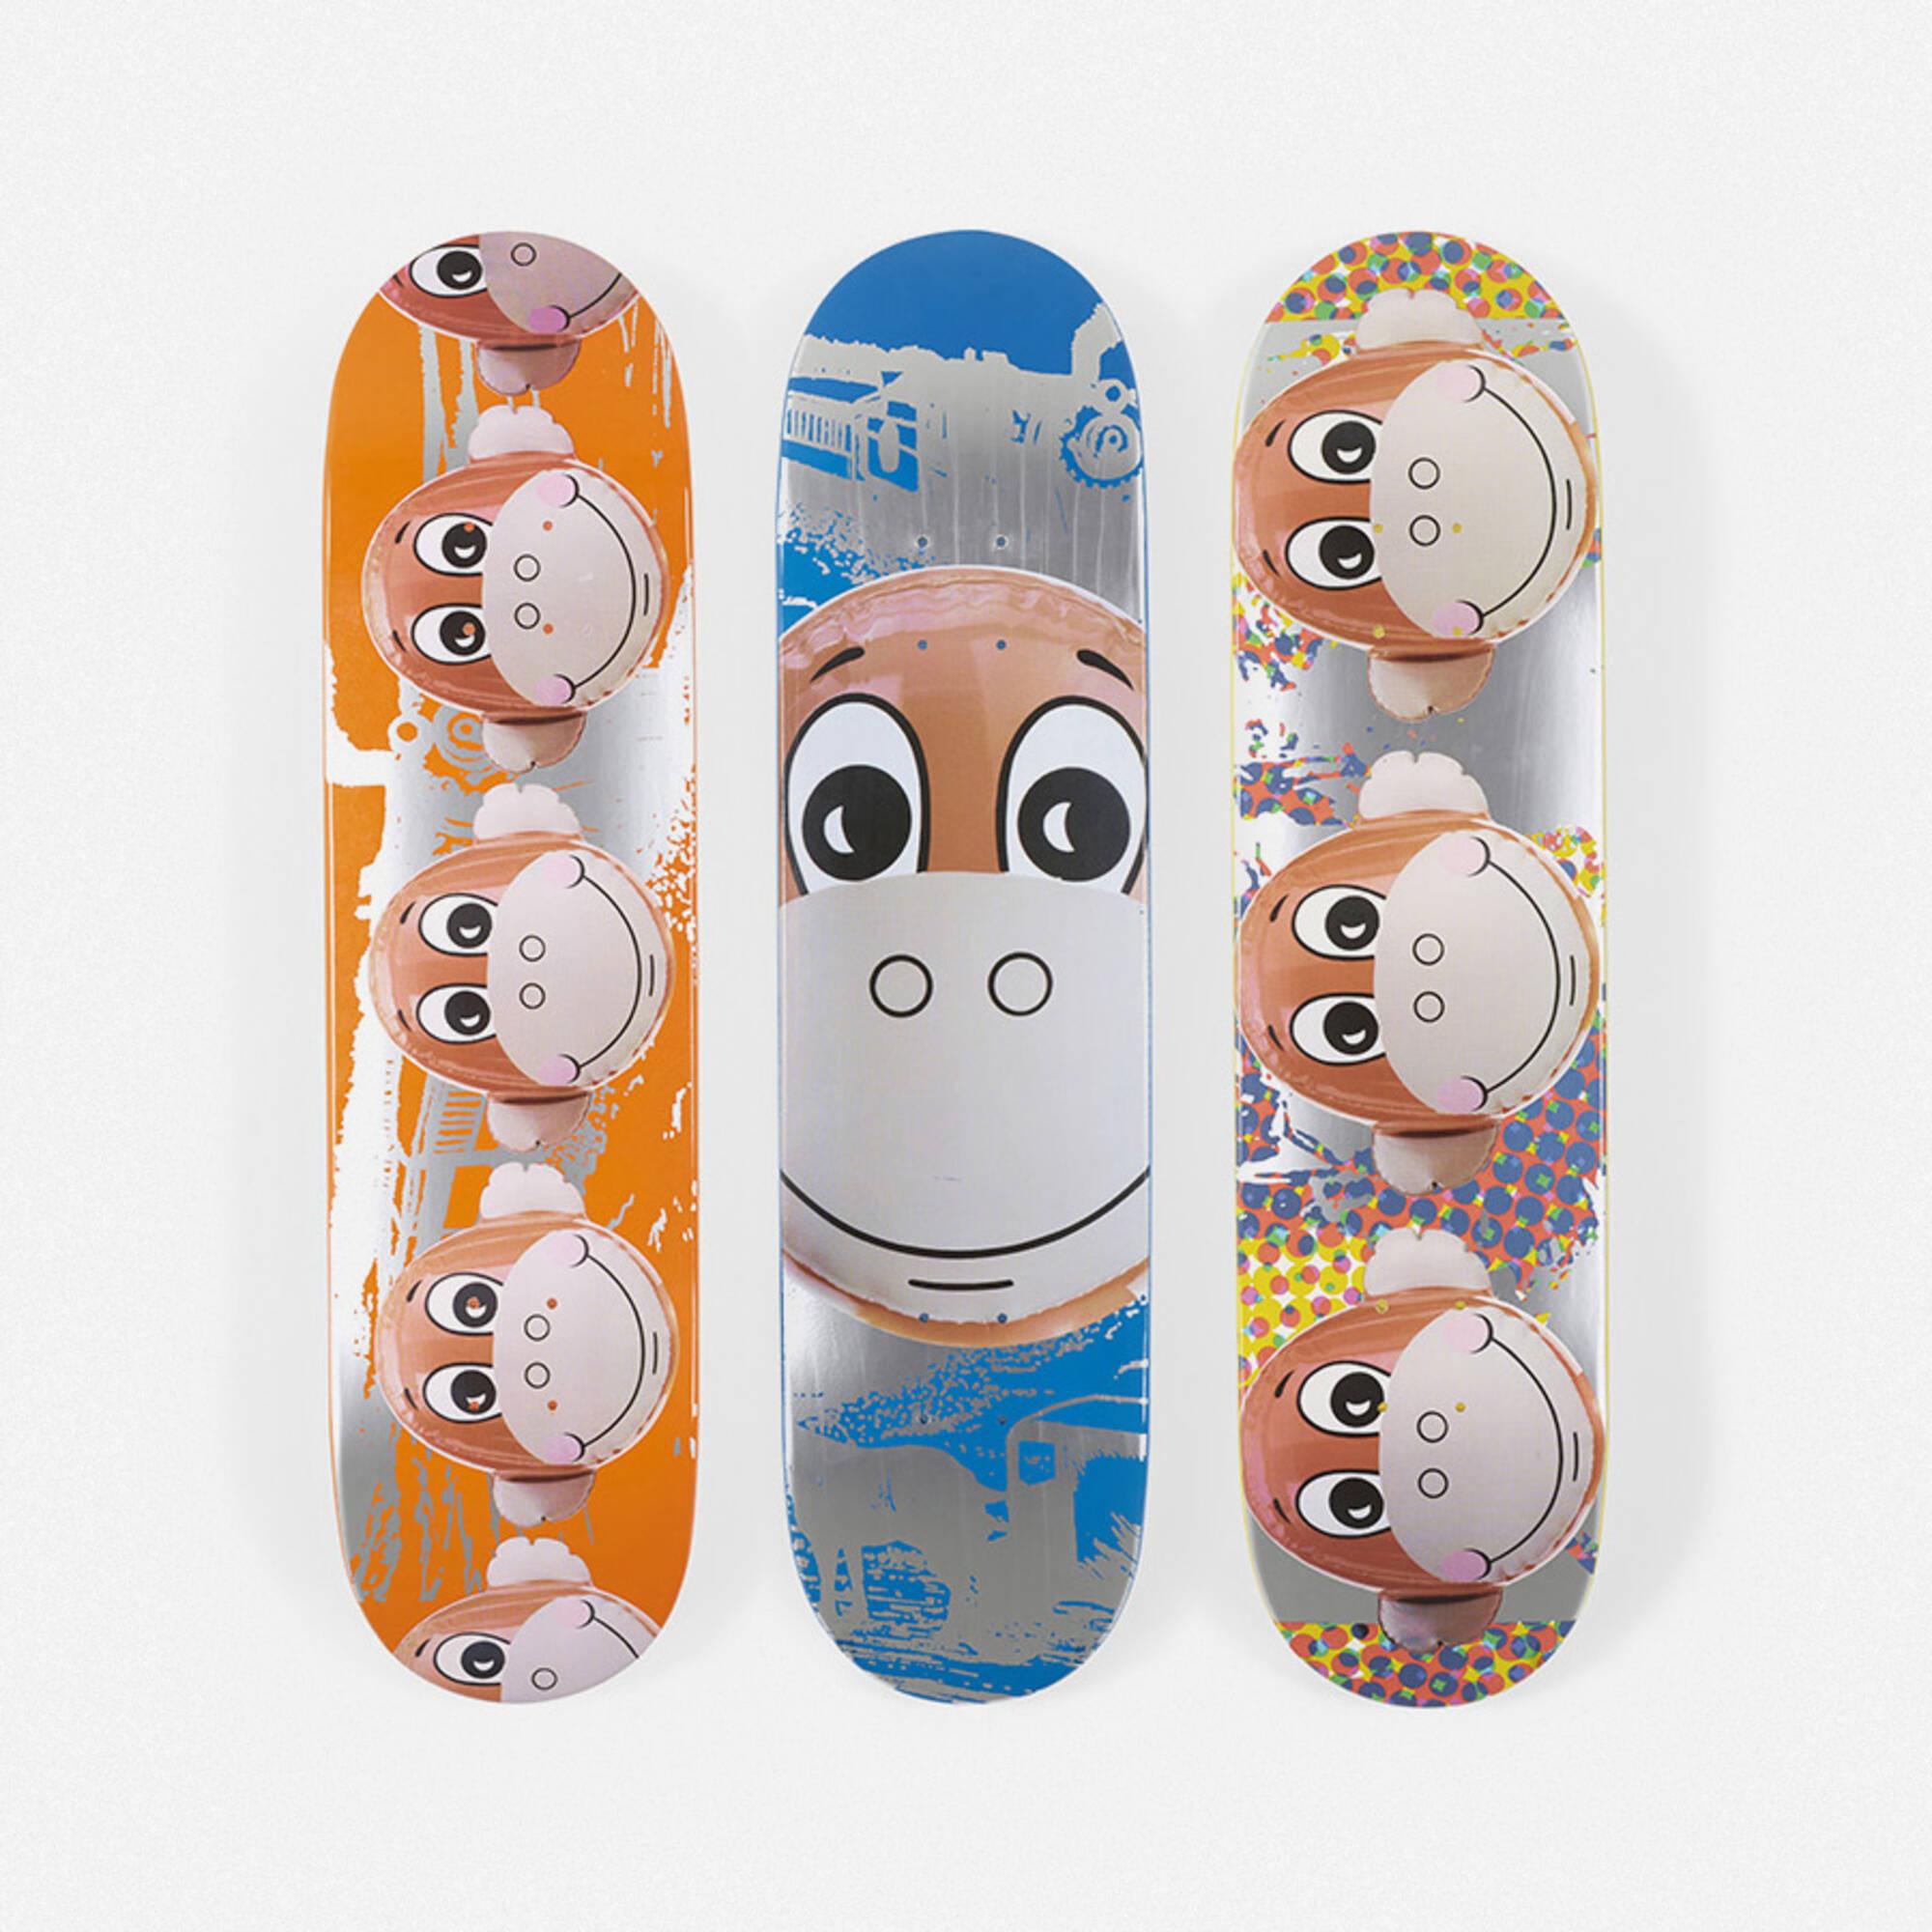 398: Jeff Koons / Monkey Train skateboard decks, set of three (1 of 1)